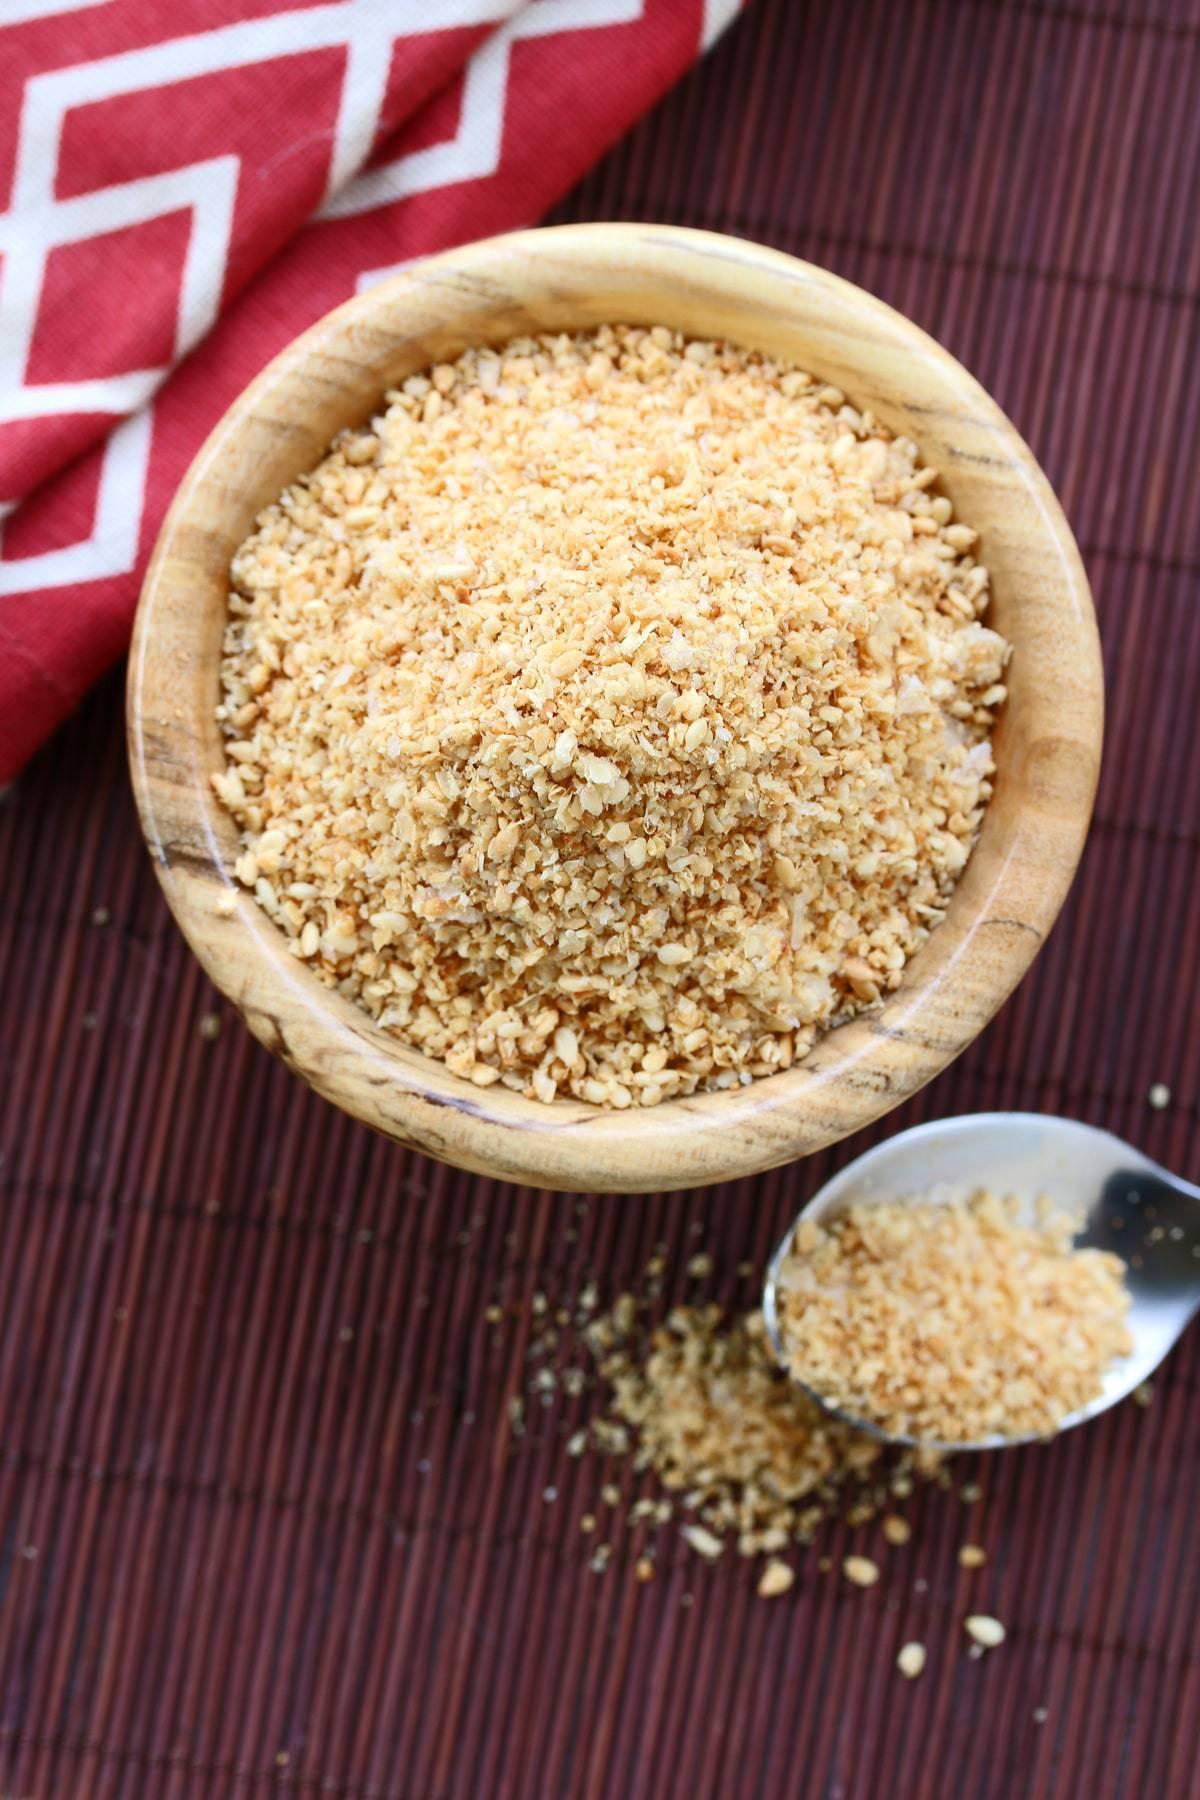 gomasio recipe japanese sesame salt seasoning blend authentic traditional low sodium